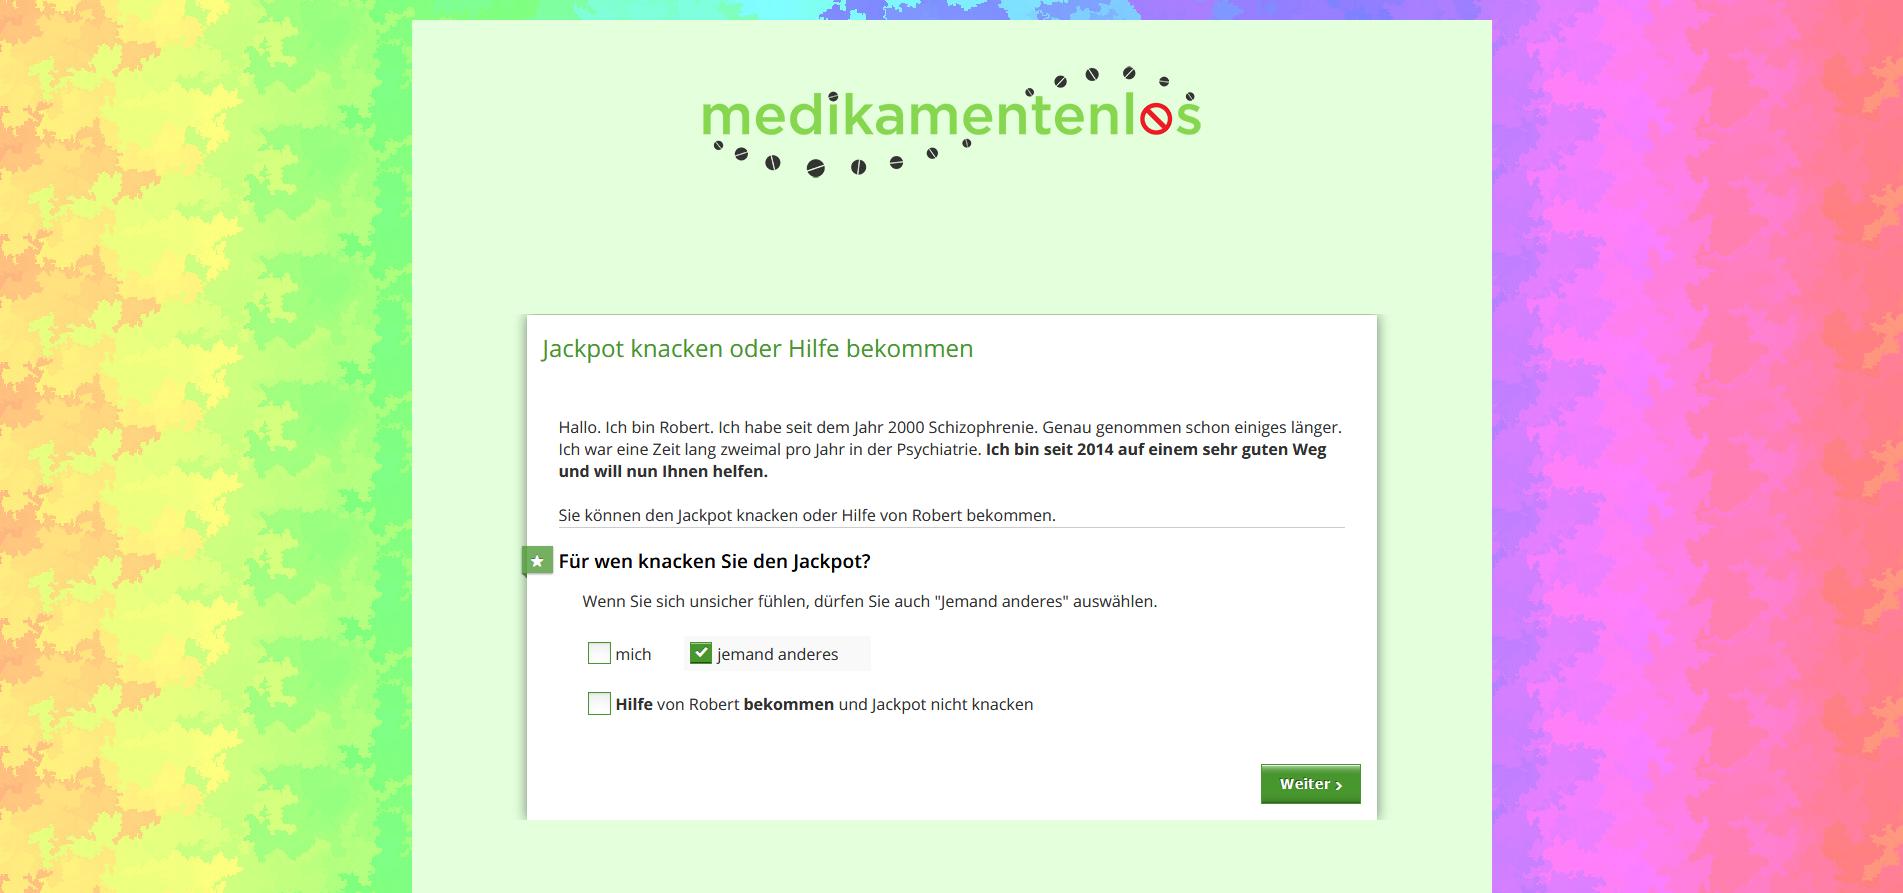 medikamentenlos.ch